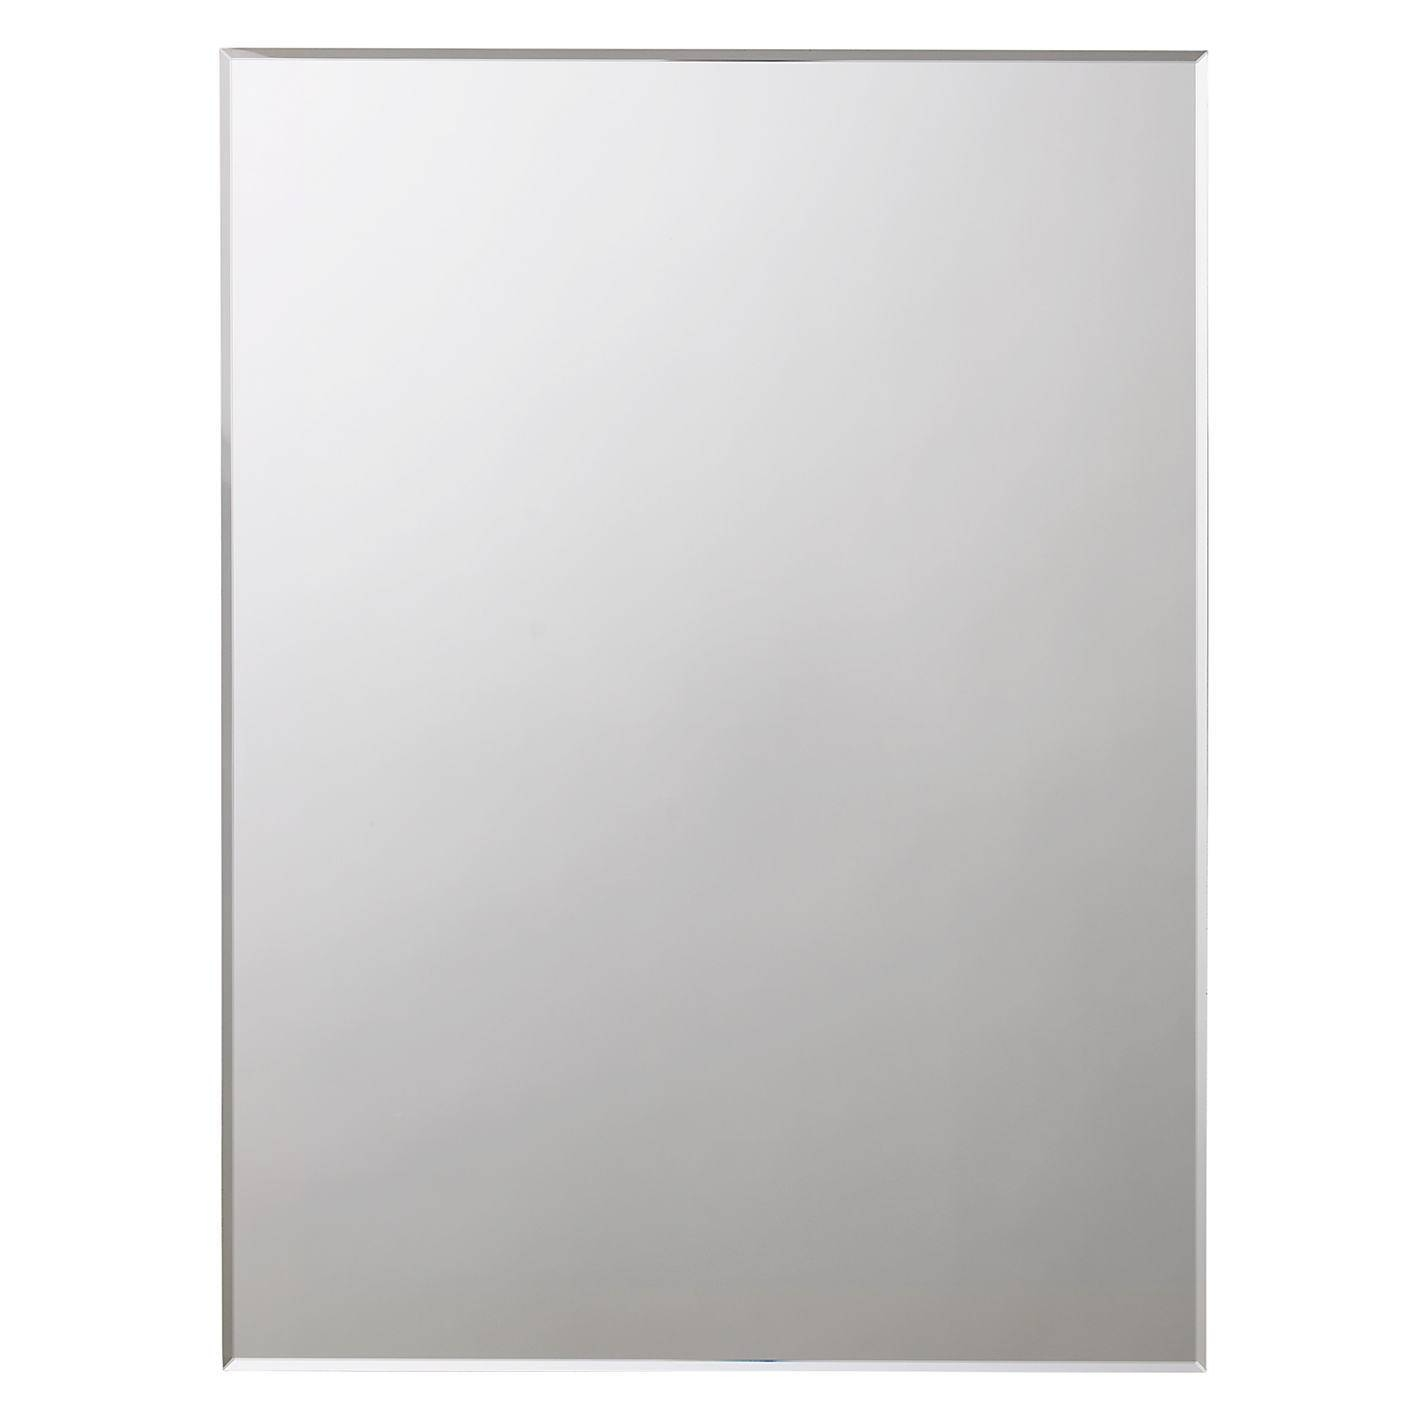 Marvelous Buy John Lewis Bevelled Edge Bathroom Mirror John Lewis intended for Bevelled Edge Bathroom Mirrors (Image 10 of 15)